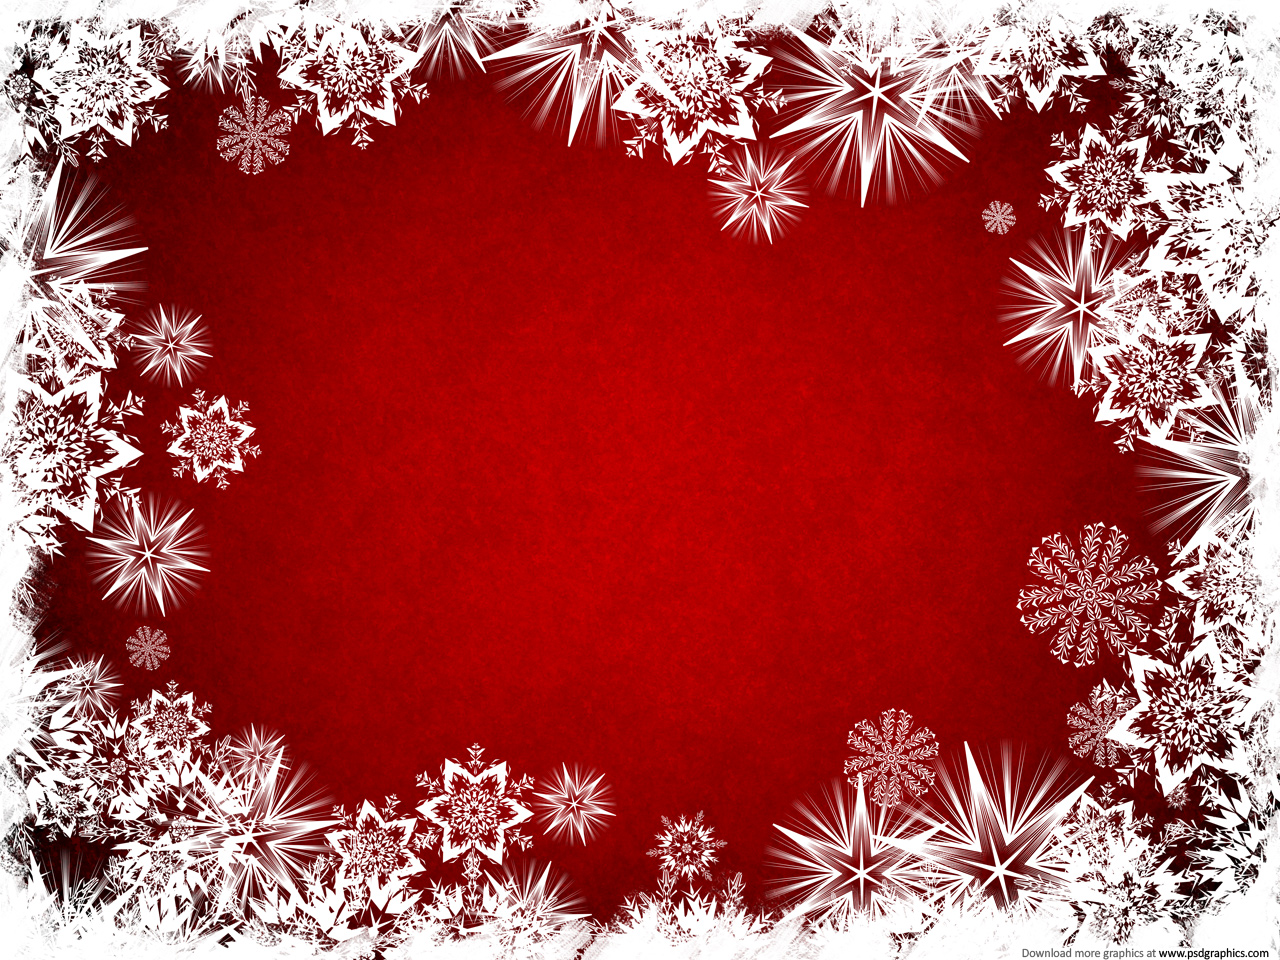 Christmas Graphics Background.Abstract Christmas Background Psdgraphics